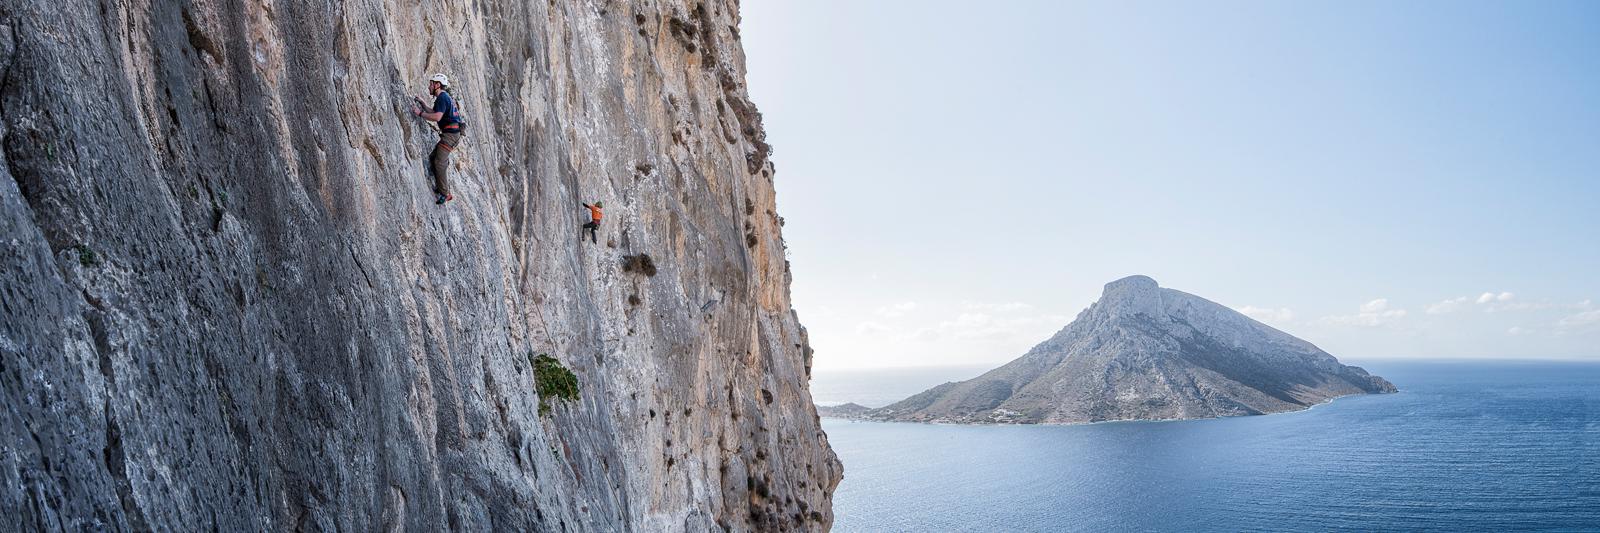 sport-climbing-holiday-kalymnos